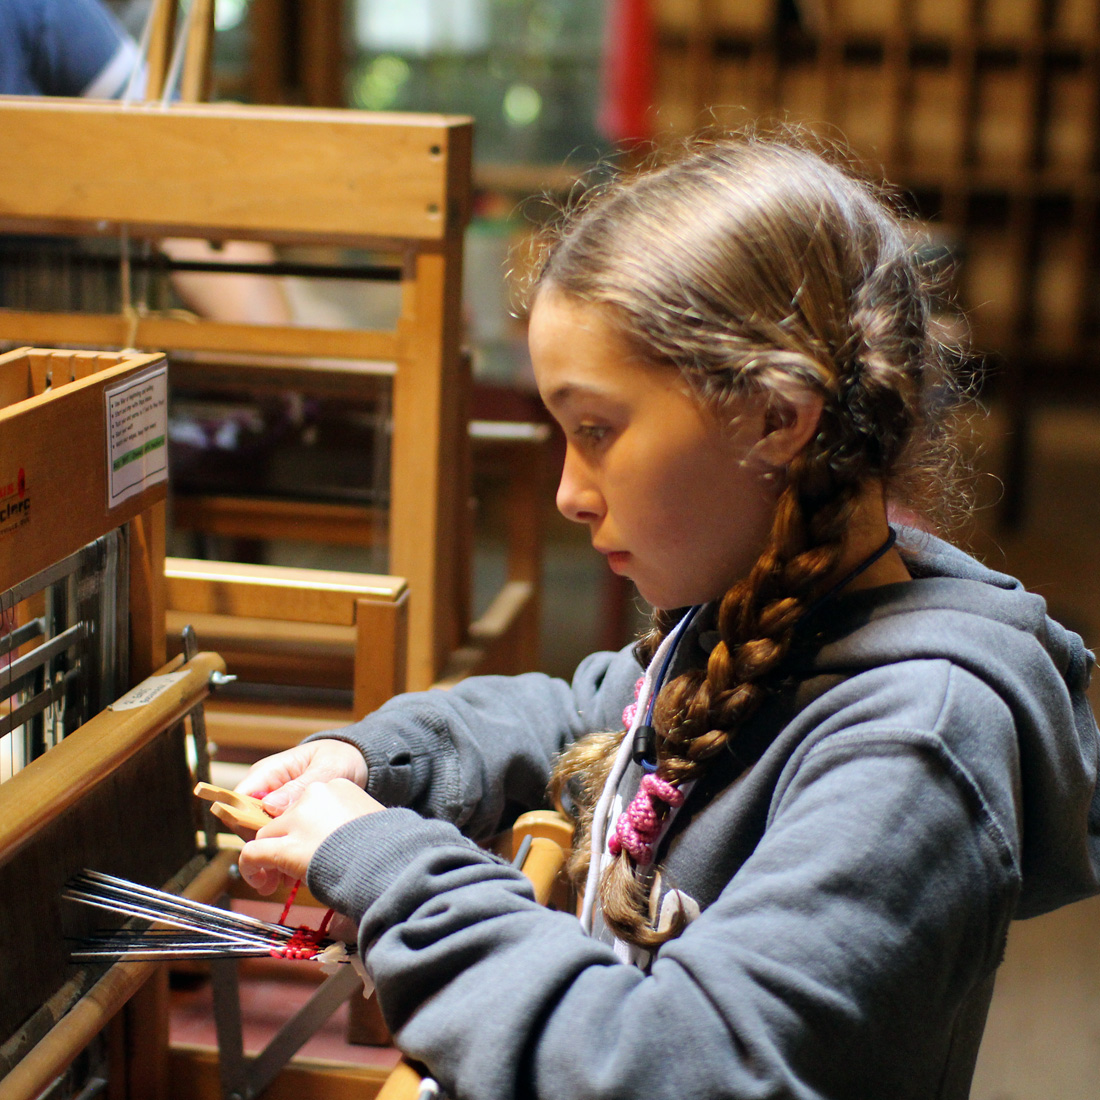 Camp Girl Weaving